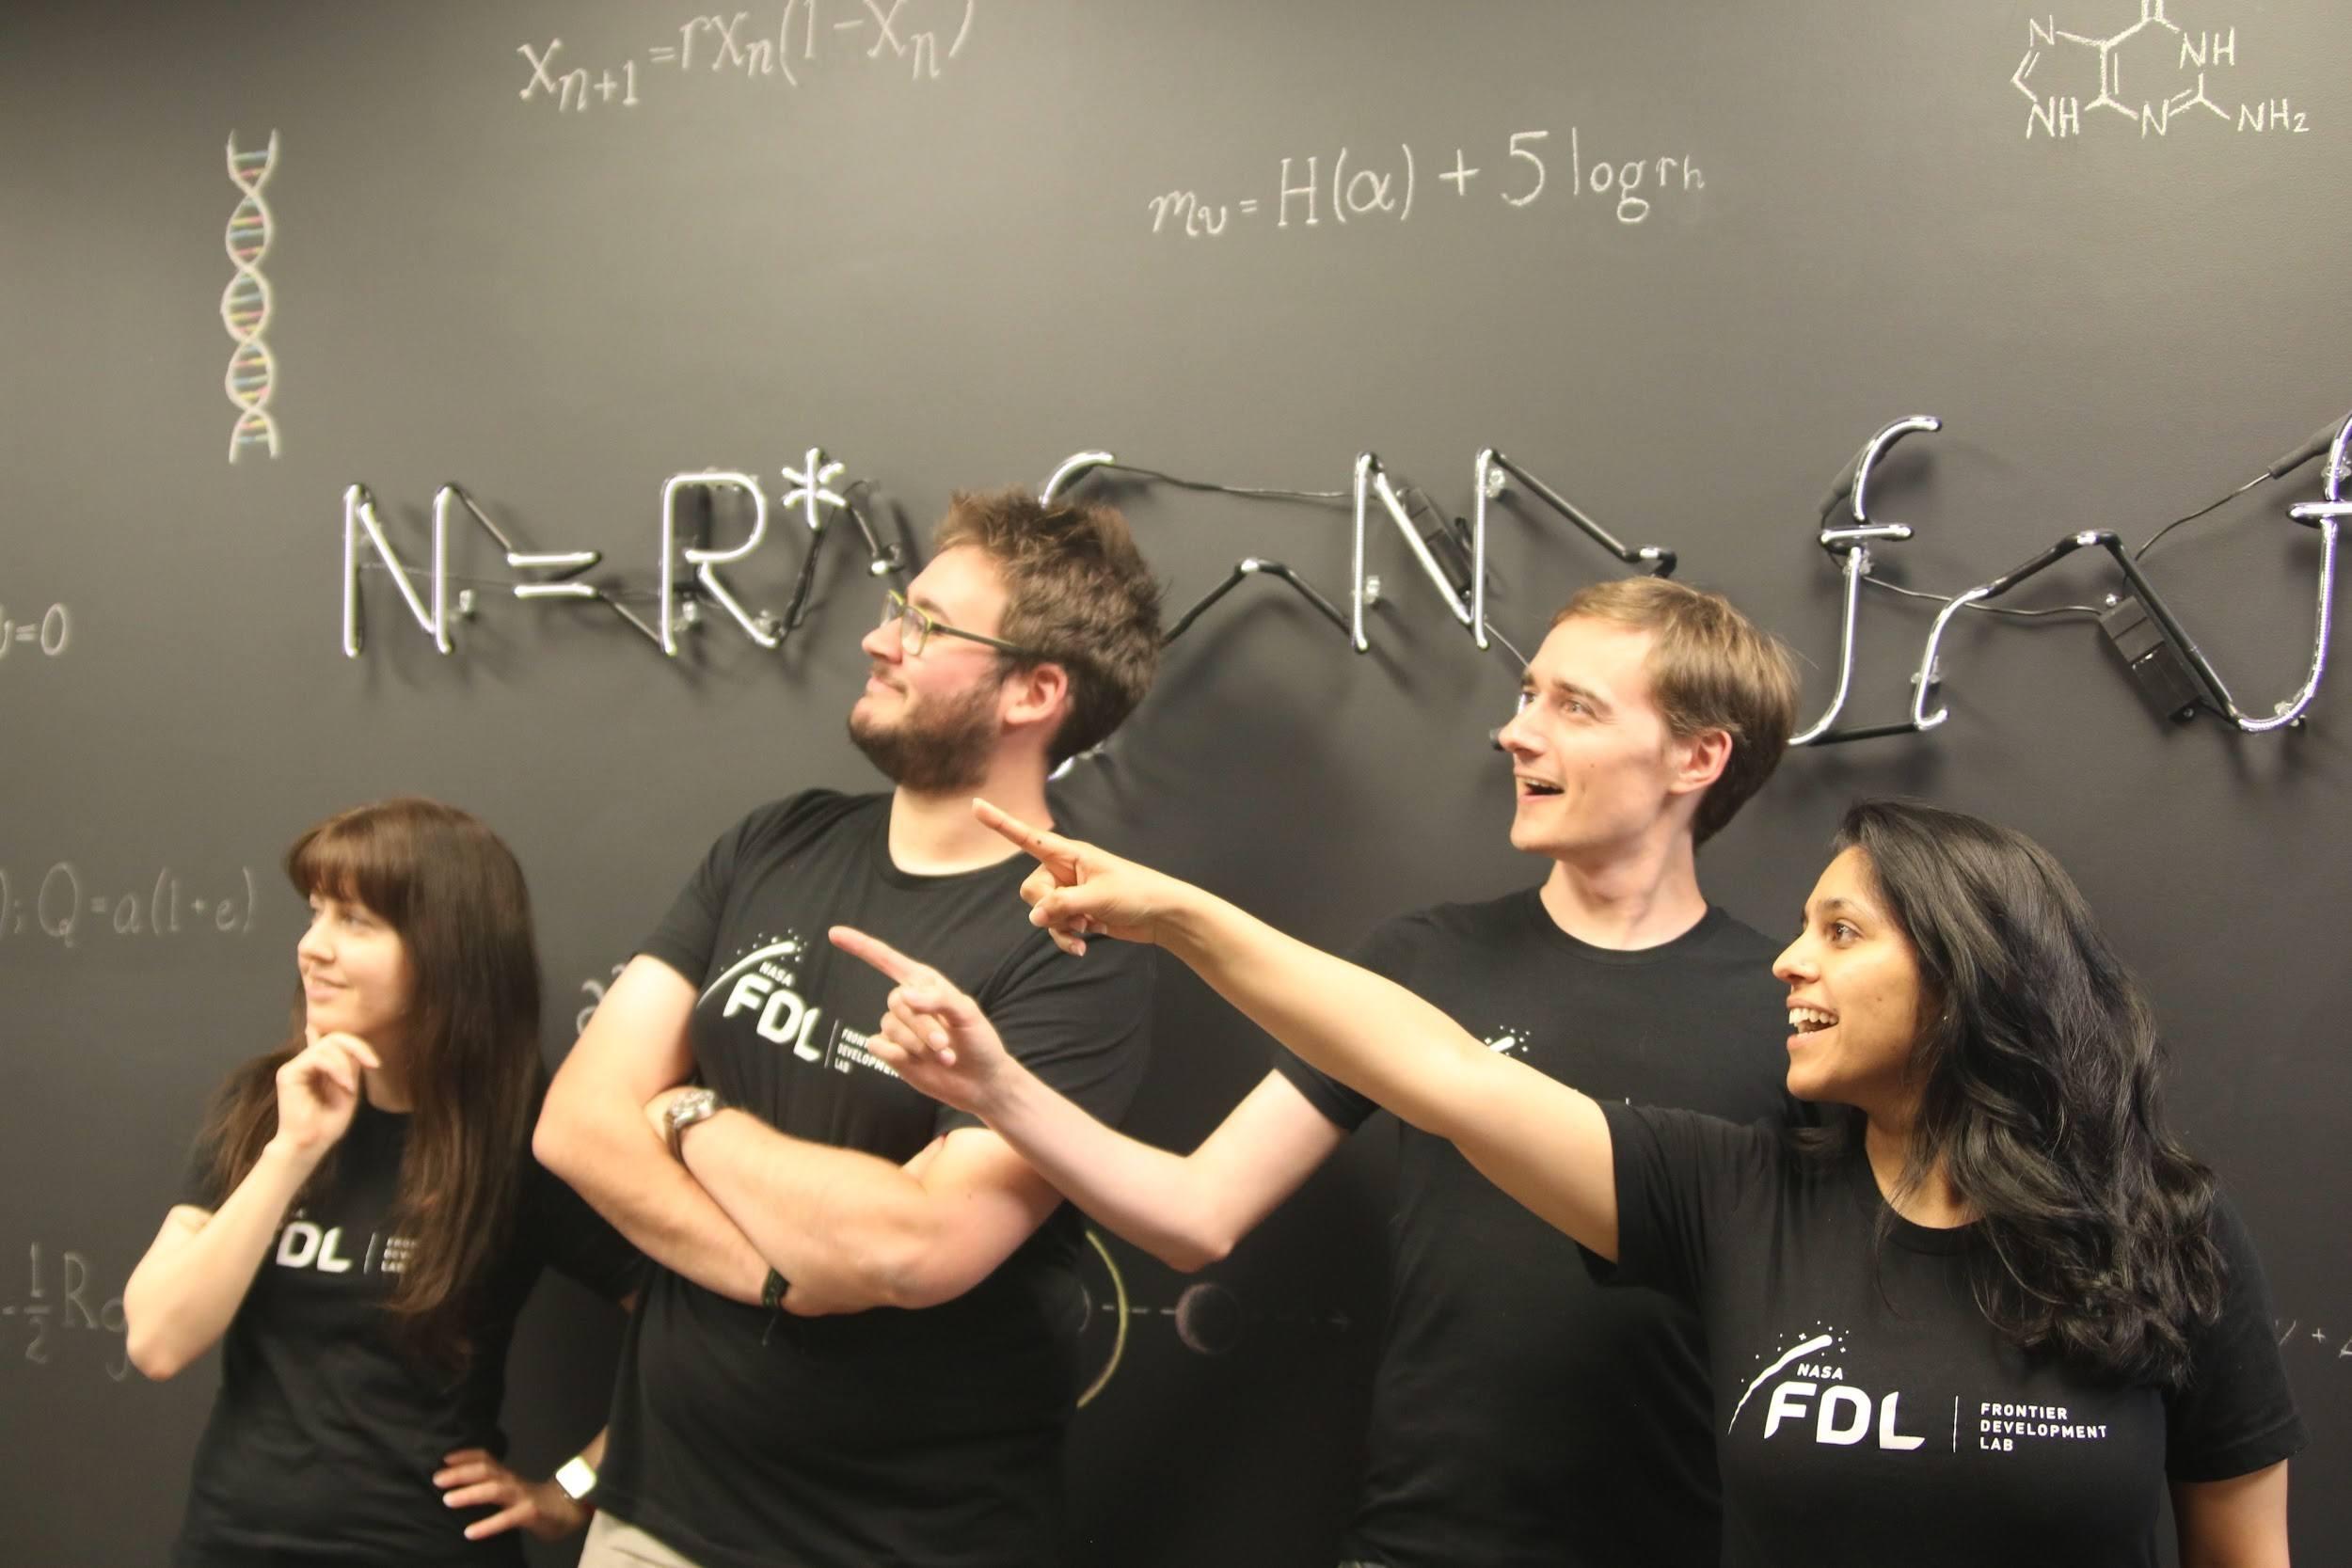 Figure 3: the GNSS team. From left to right: Kara Lamb (CIRES / NOAA), Athanasios Vlontzos (Imperial College London); Edward Wagstaff (University of Oxford); Garima Malhotra (University of Michigan).